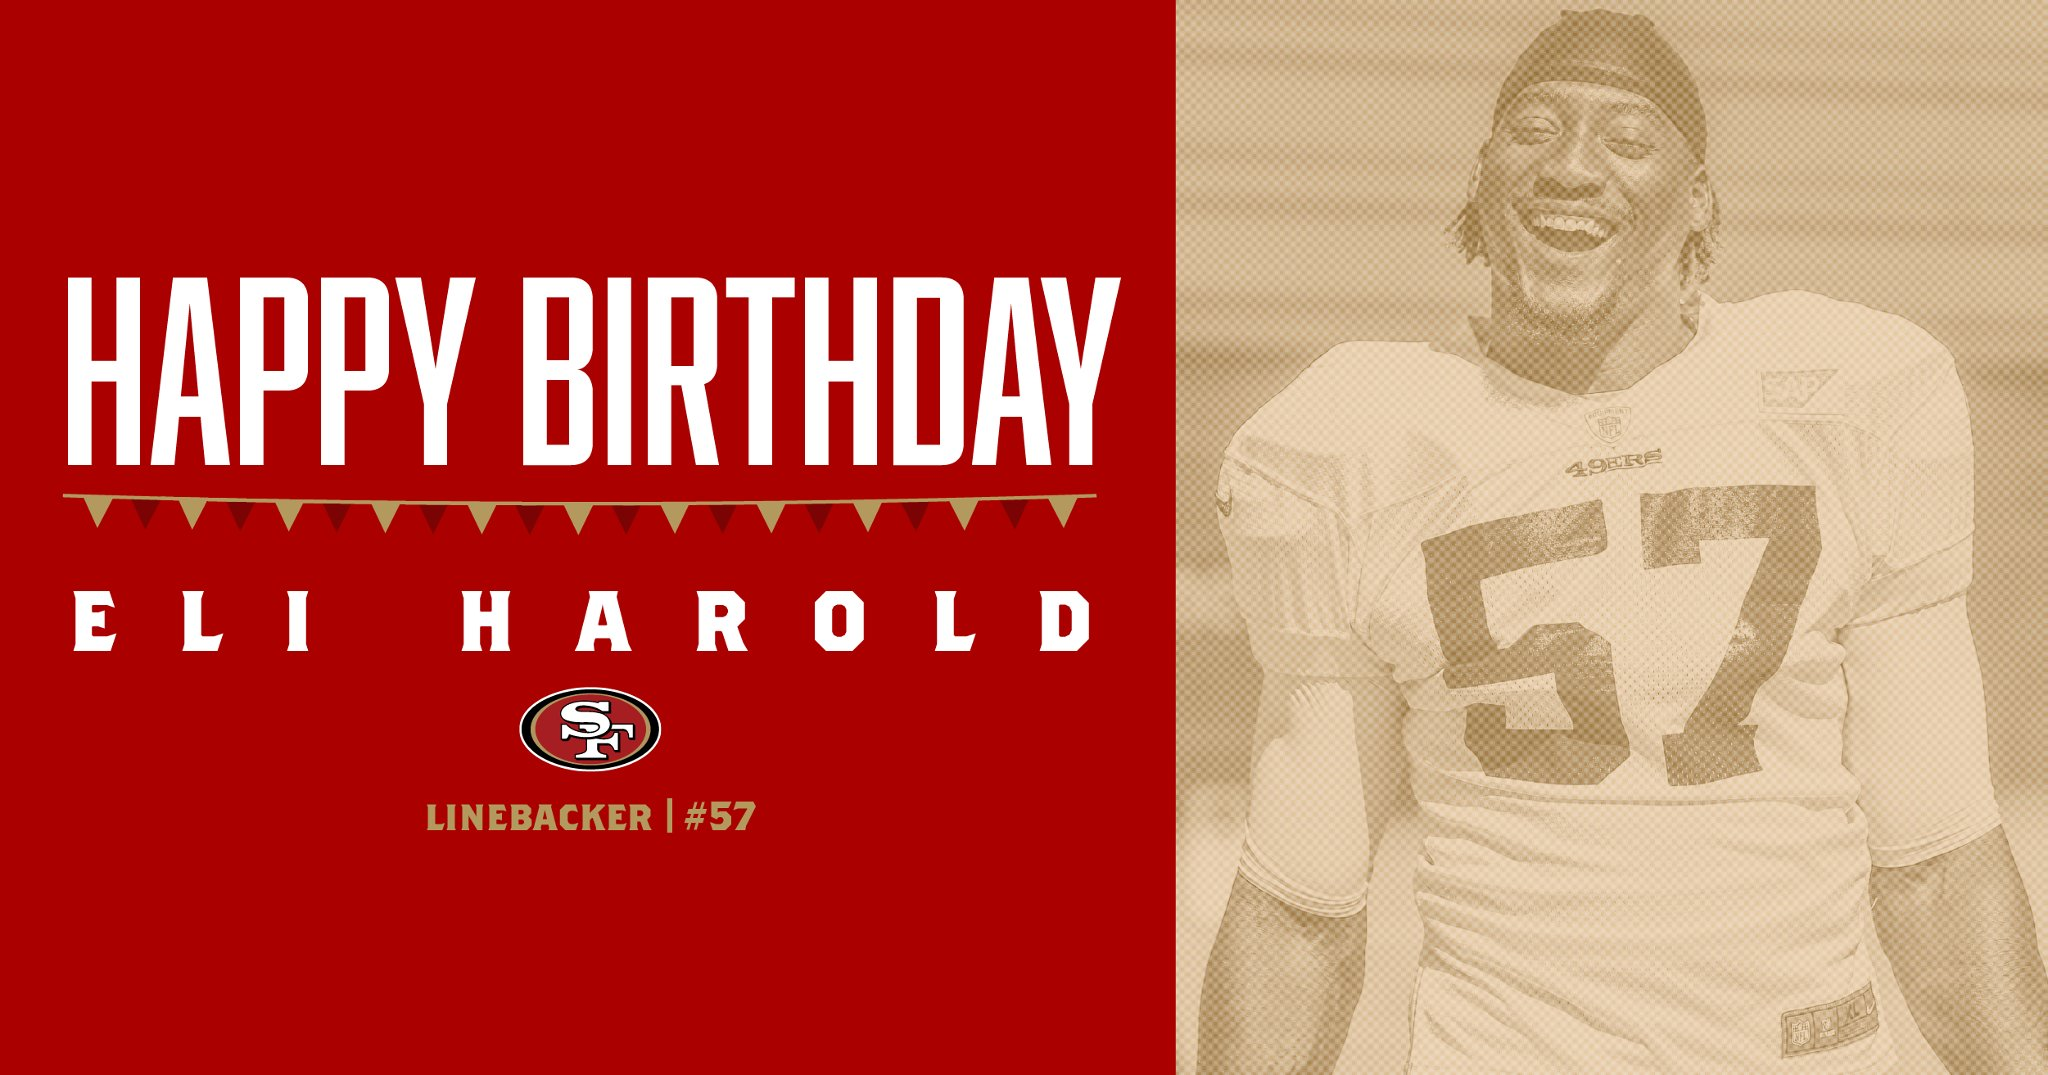 Wishing a very happy birthday to @EliHarold_ �� https://t.co/khJj5SSy73